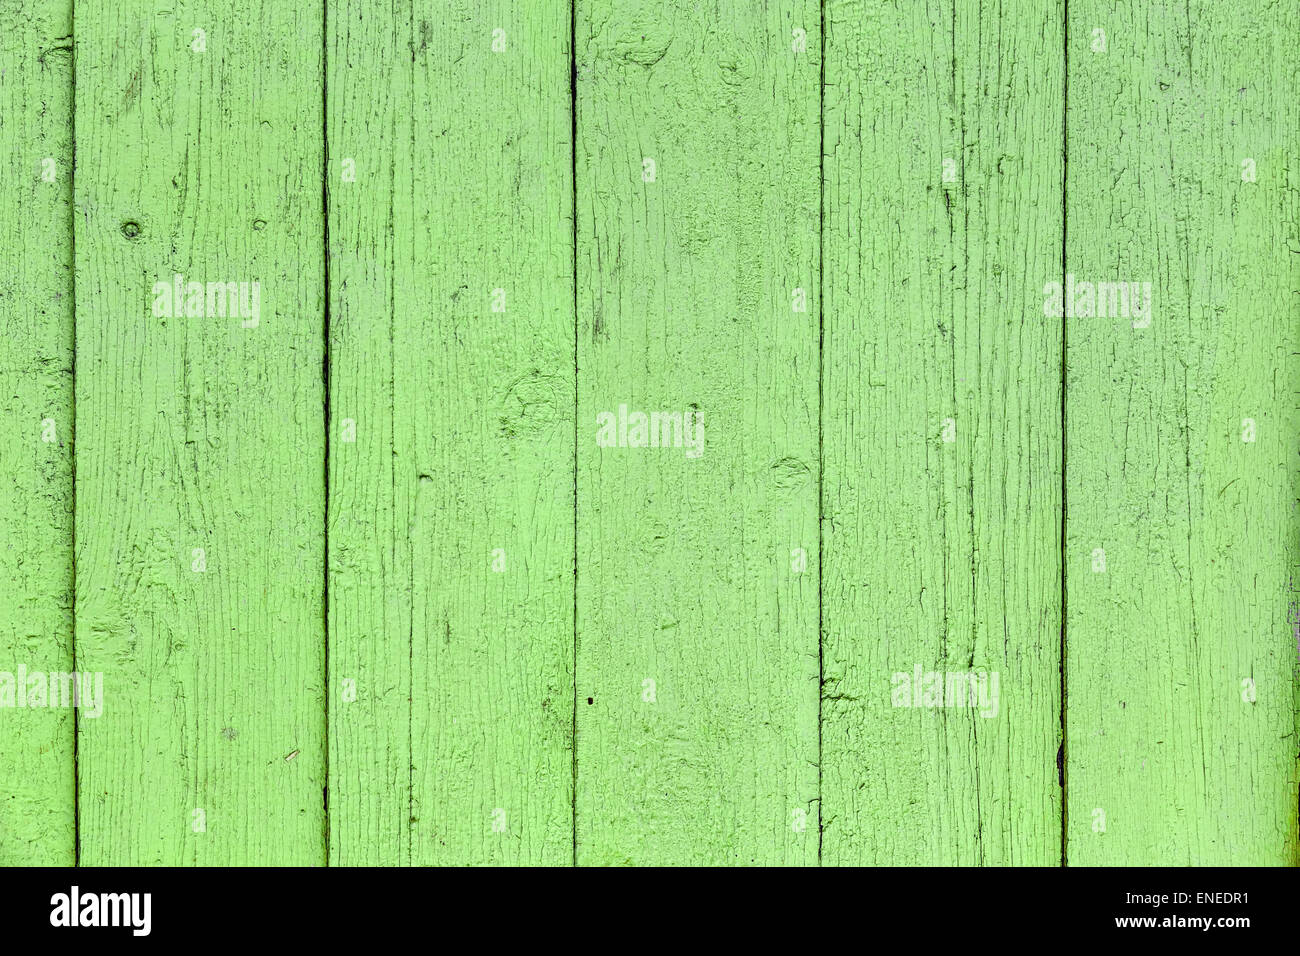 Green wood planks vintage or grunge background texture